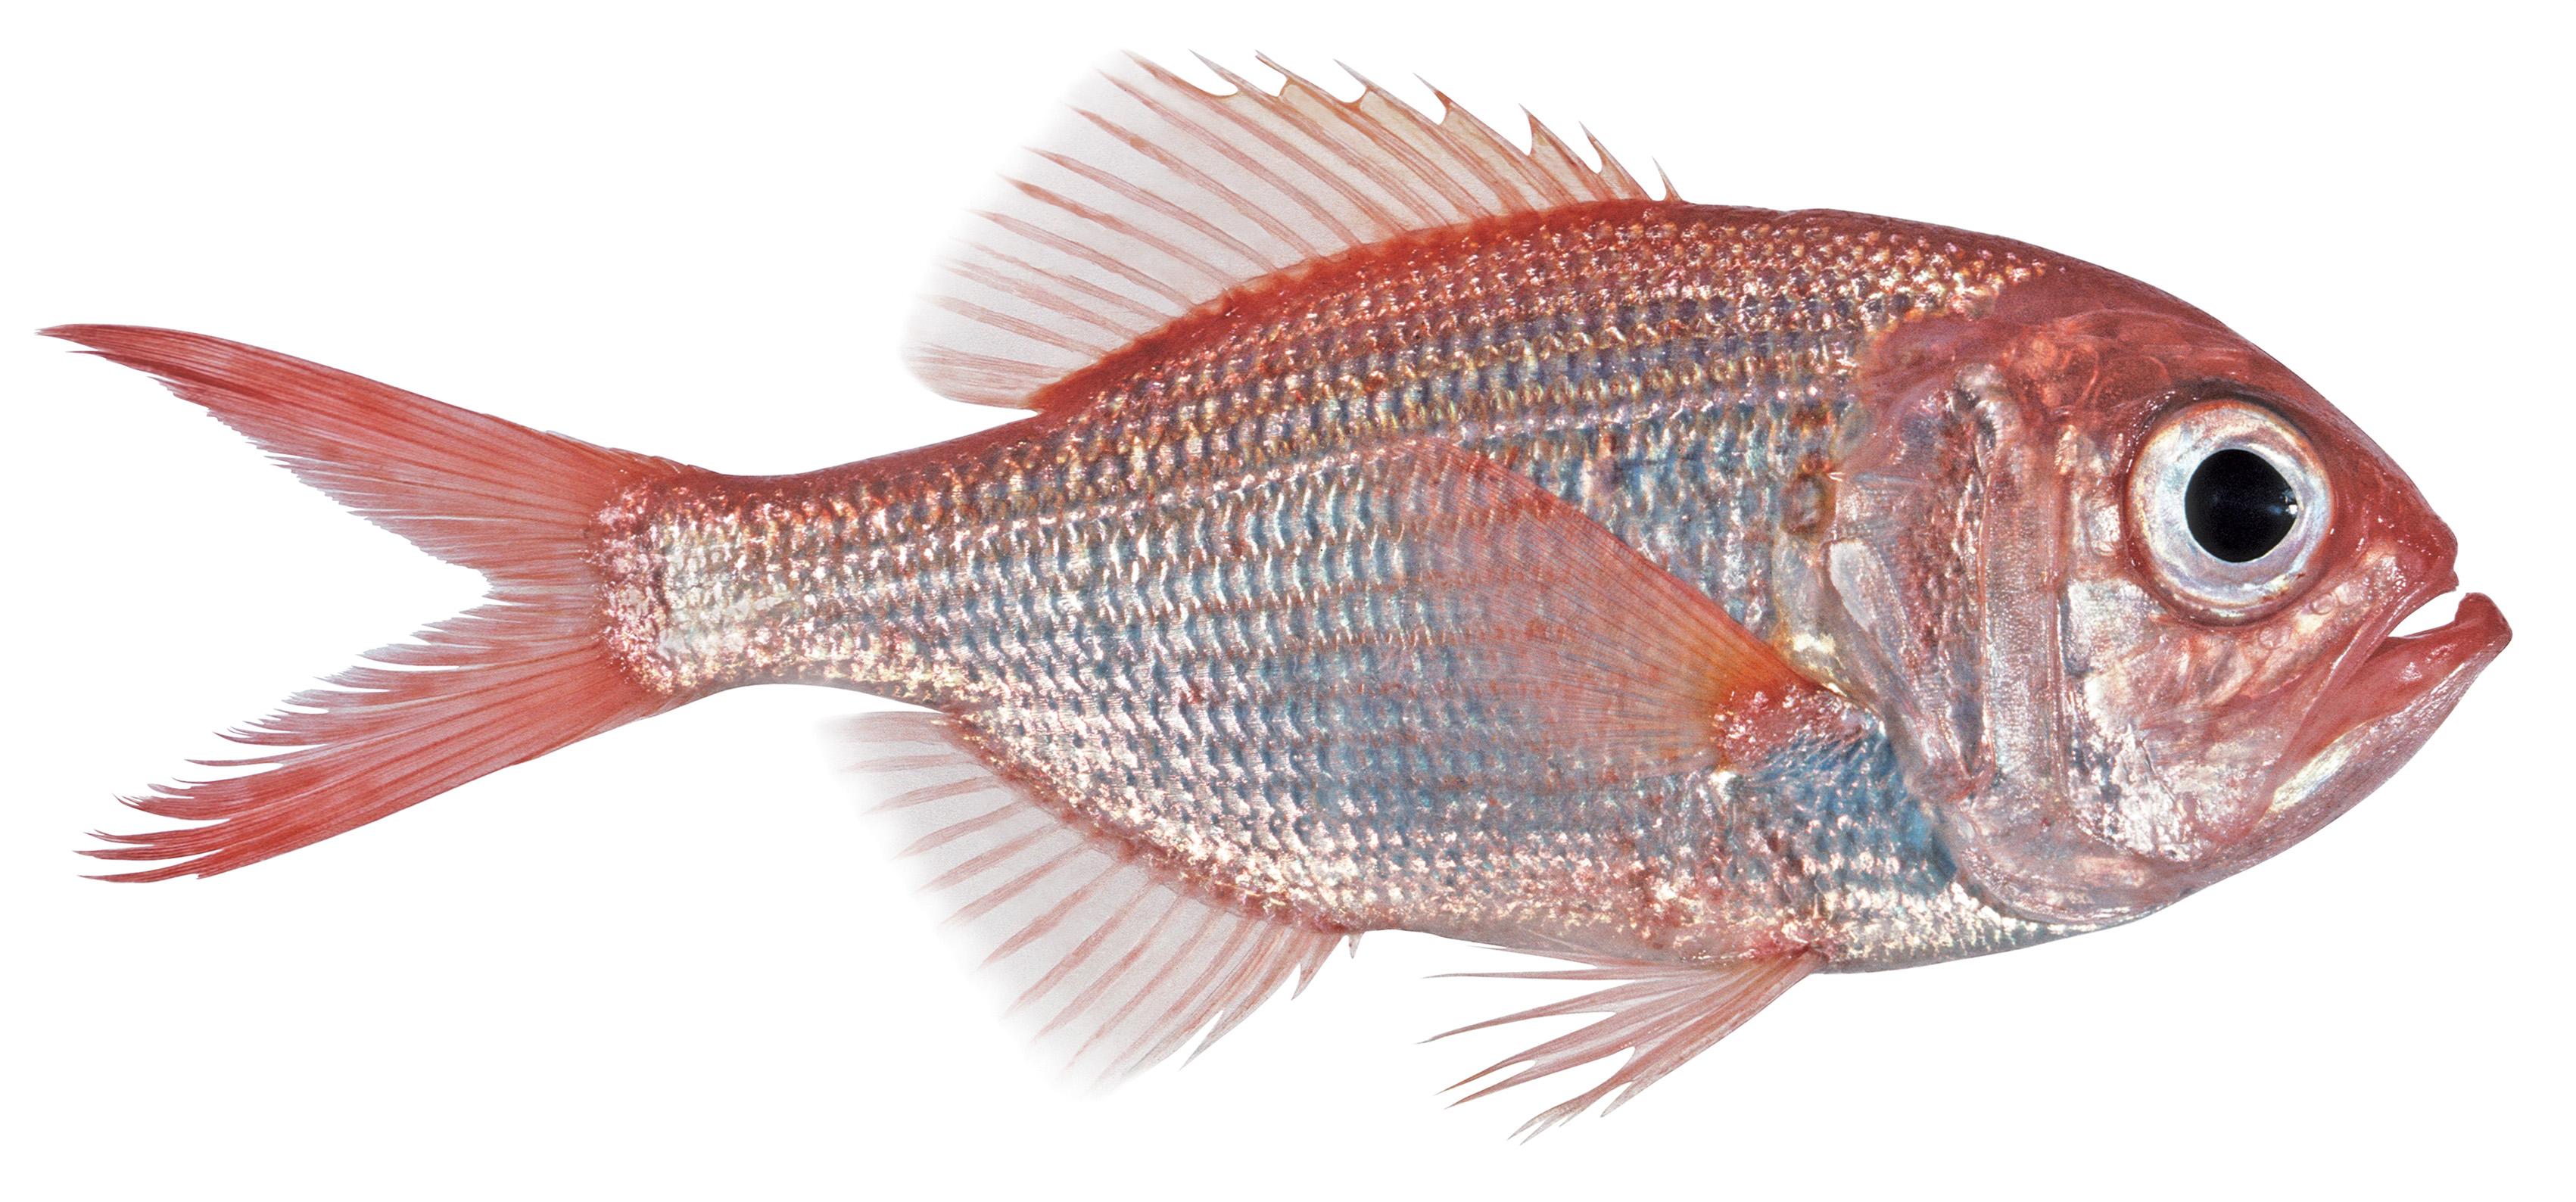 Krøyers deep sea angler fish  Wikipedia